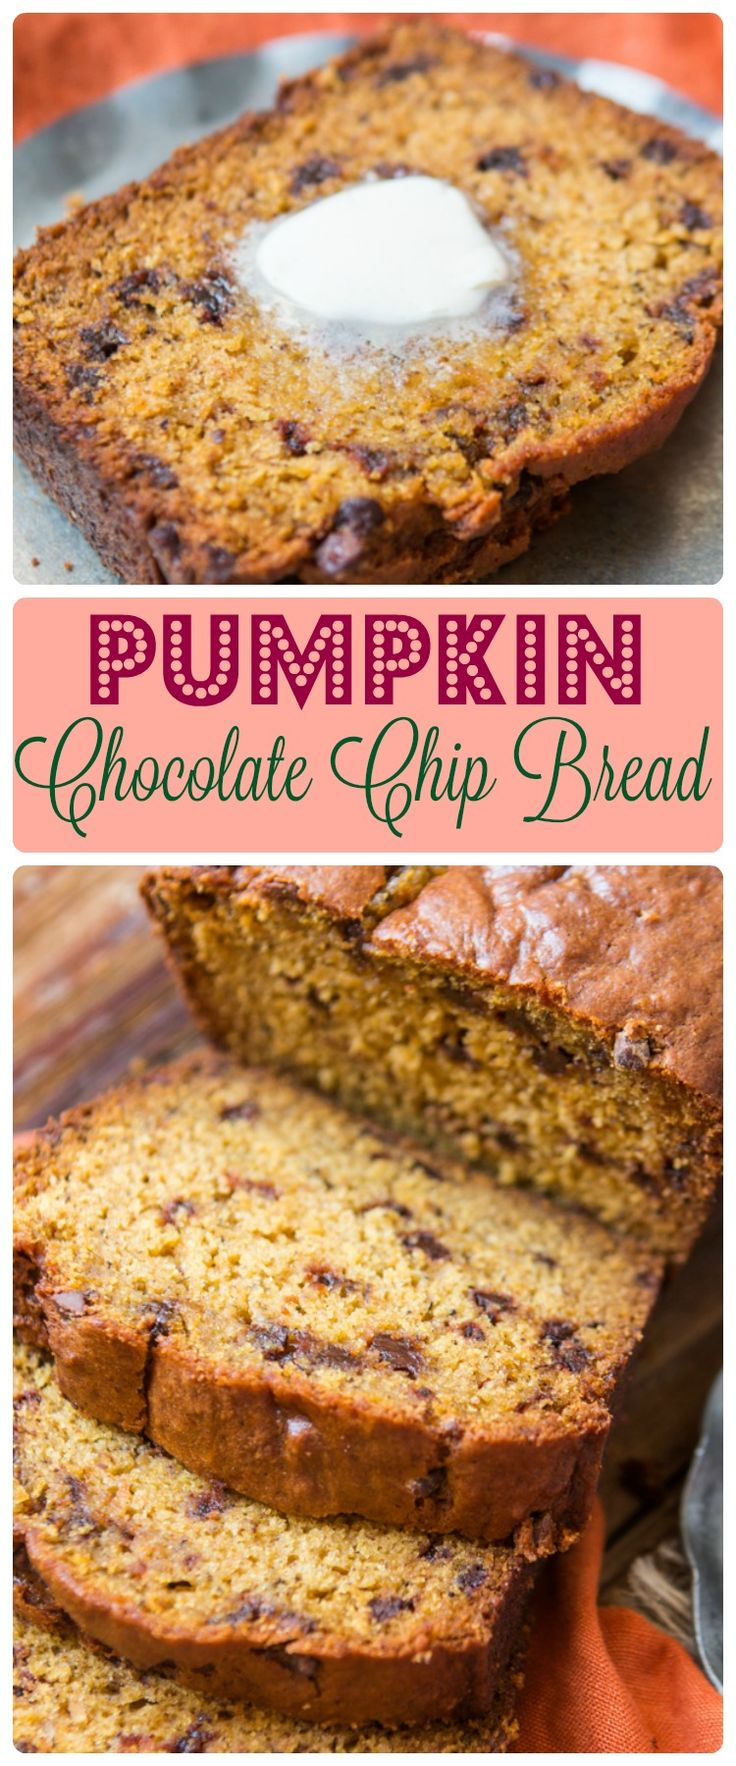 25+ best ideas about Pumpkin chocolate chip bread on Pinterest ...